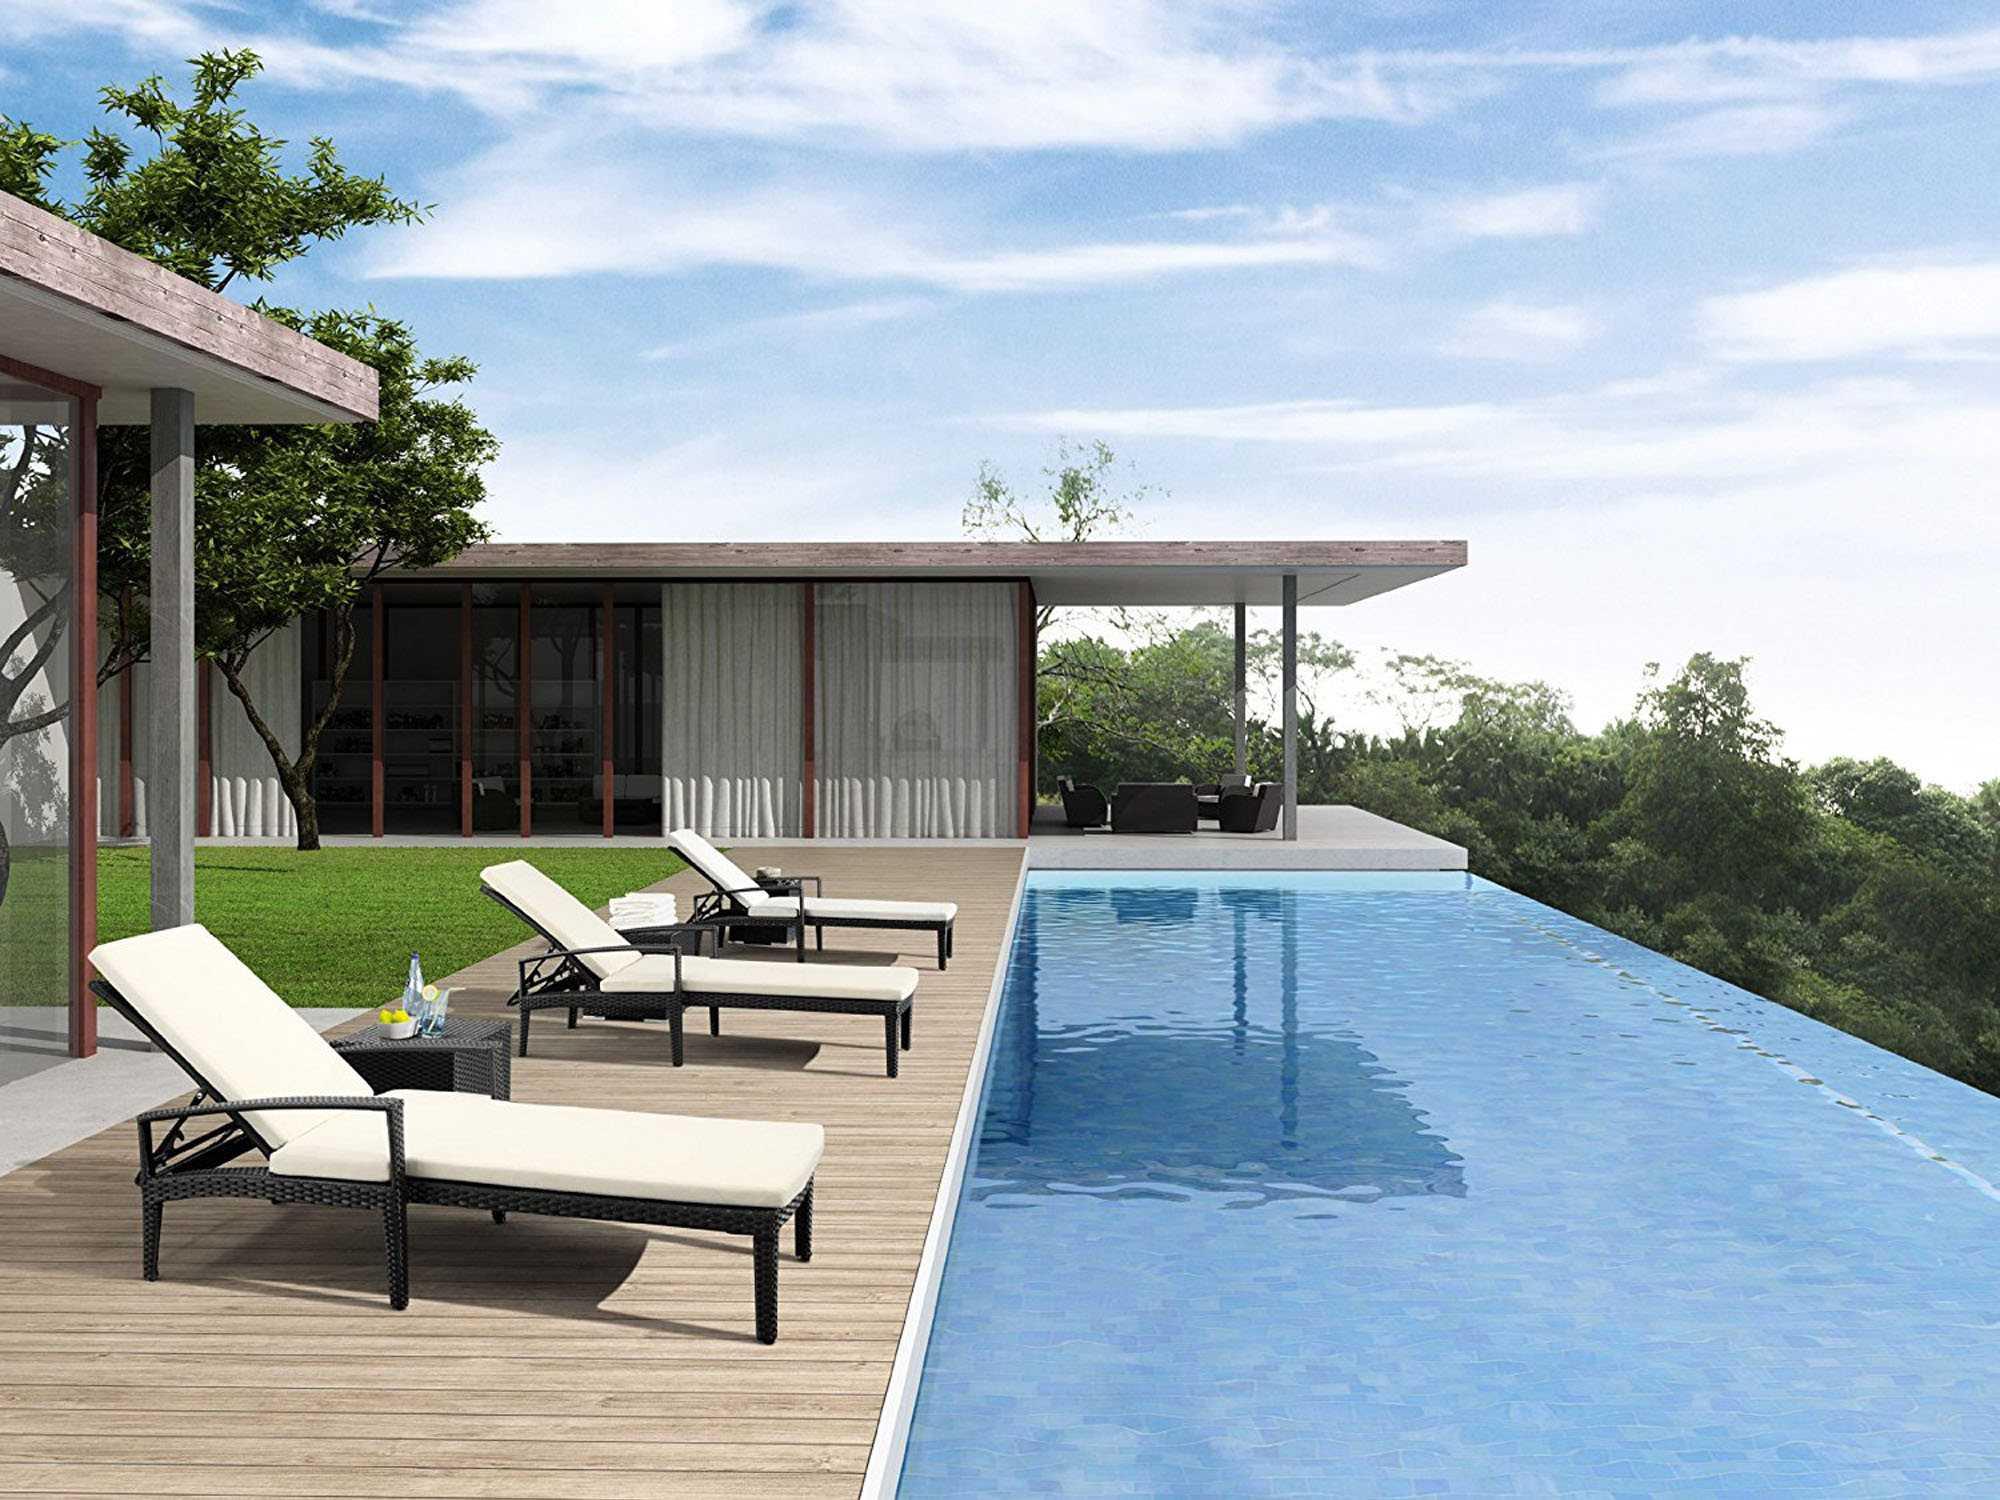 Zuo outdoor phuket wicker pool lounge set phuketlngset for Outdoor furniture phuket